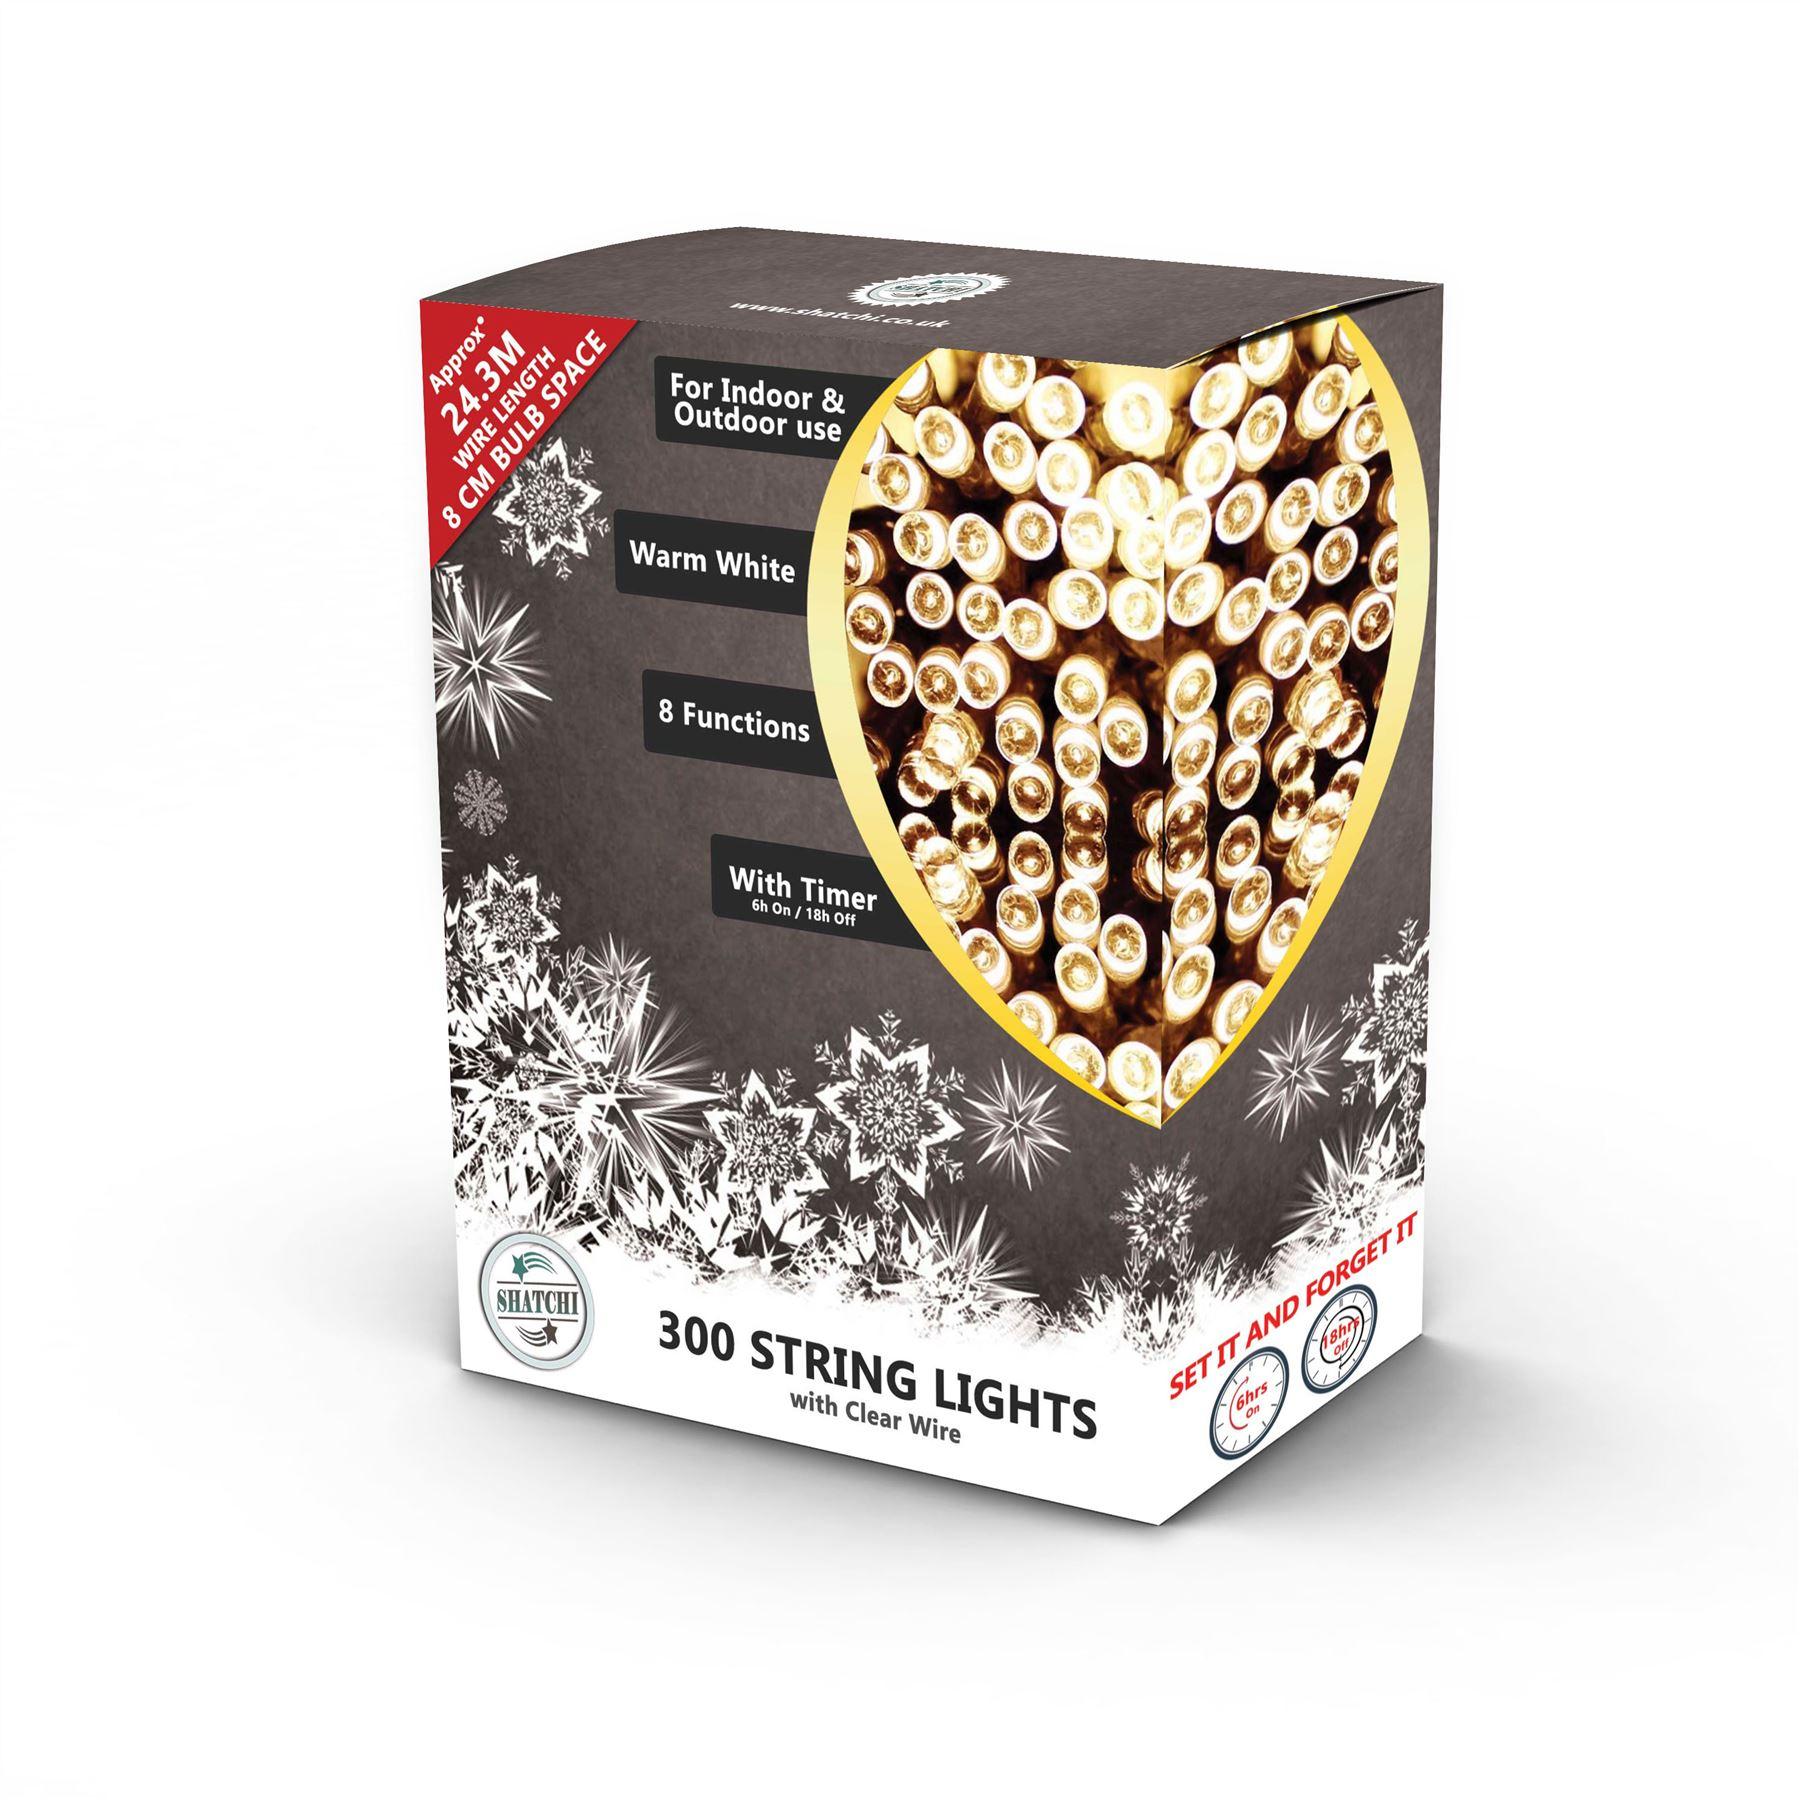 100-200-300-400-500-LED-Christmas-String-Fairy-Lights-Xmas-Decorations-Tree miniature 13